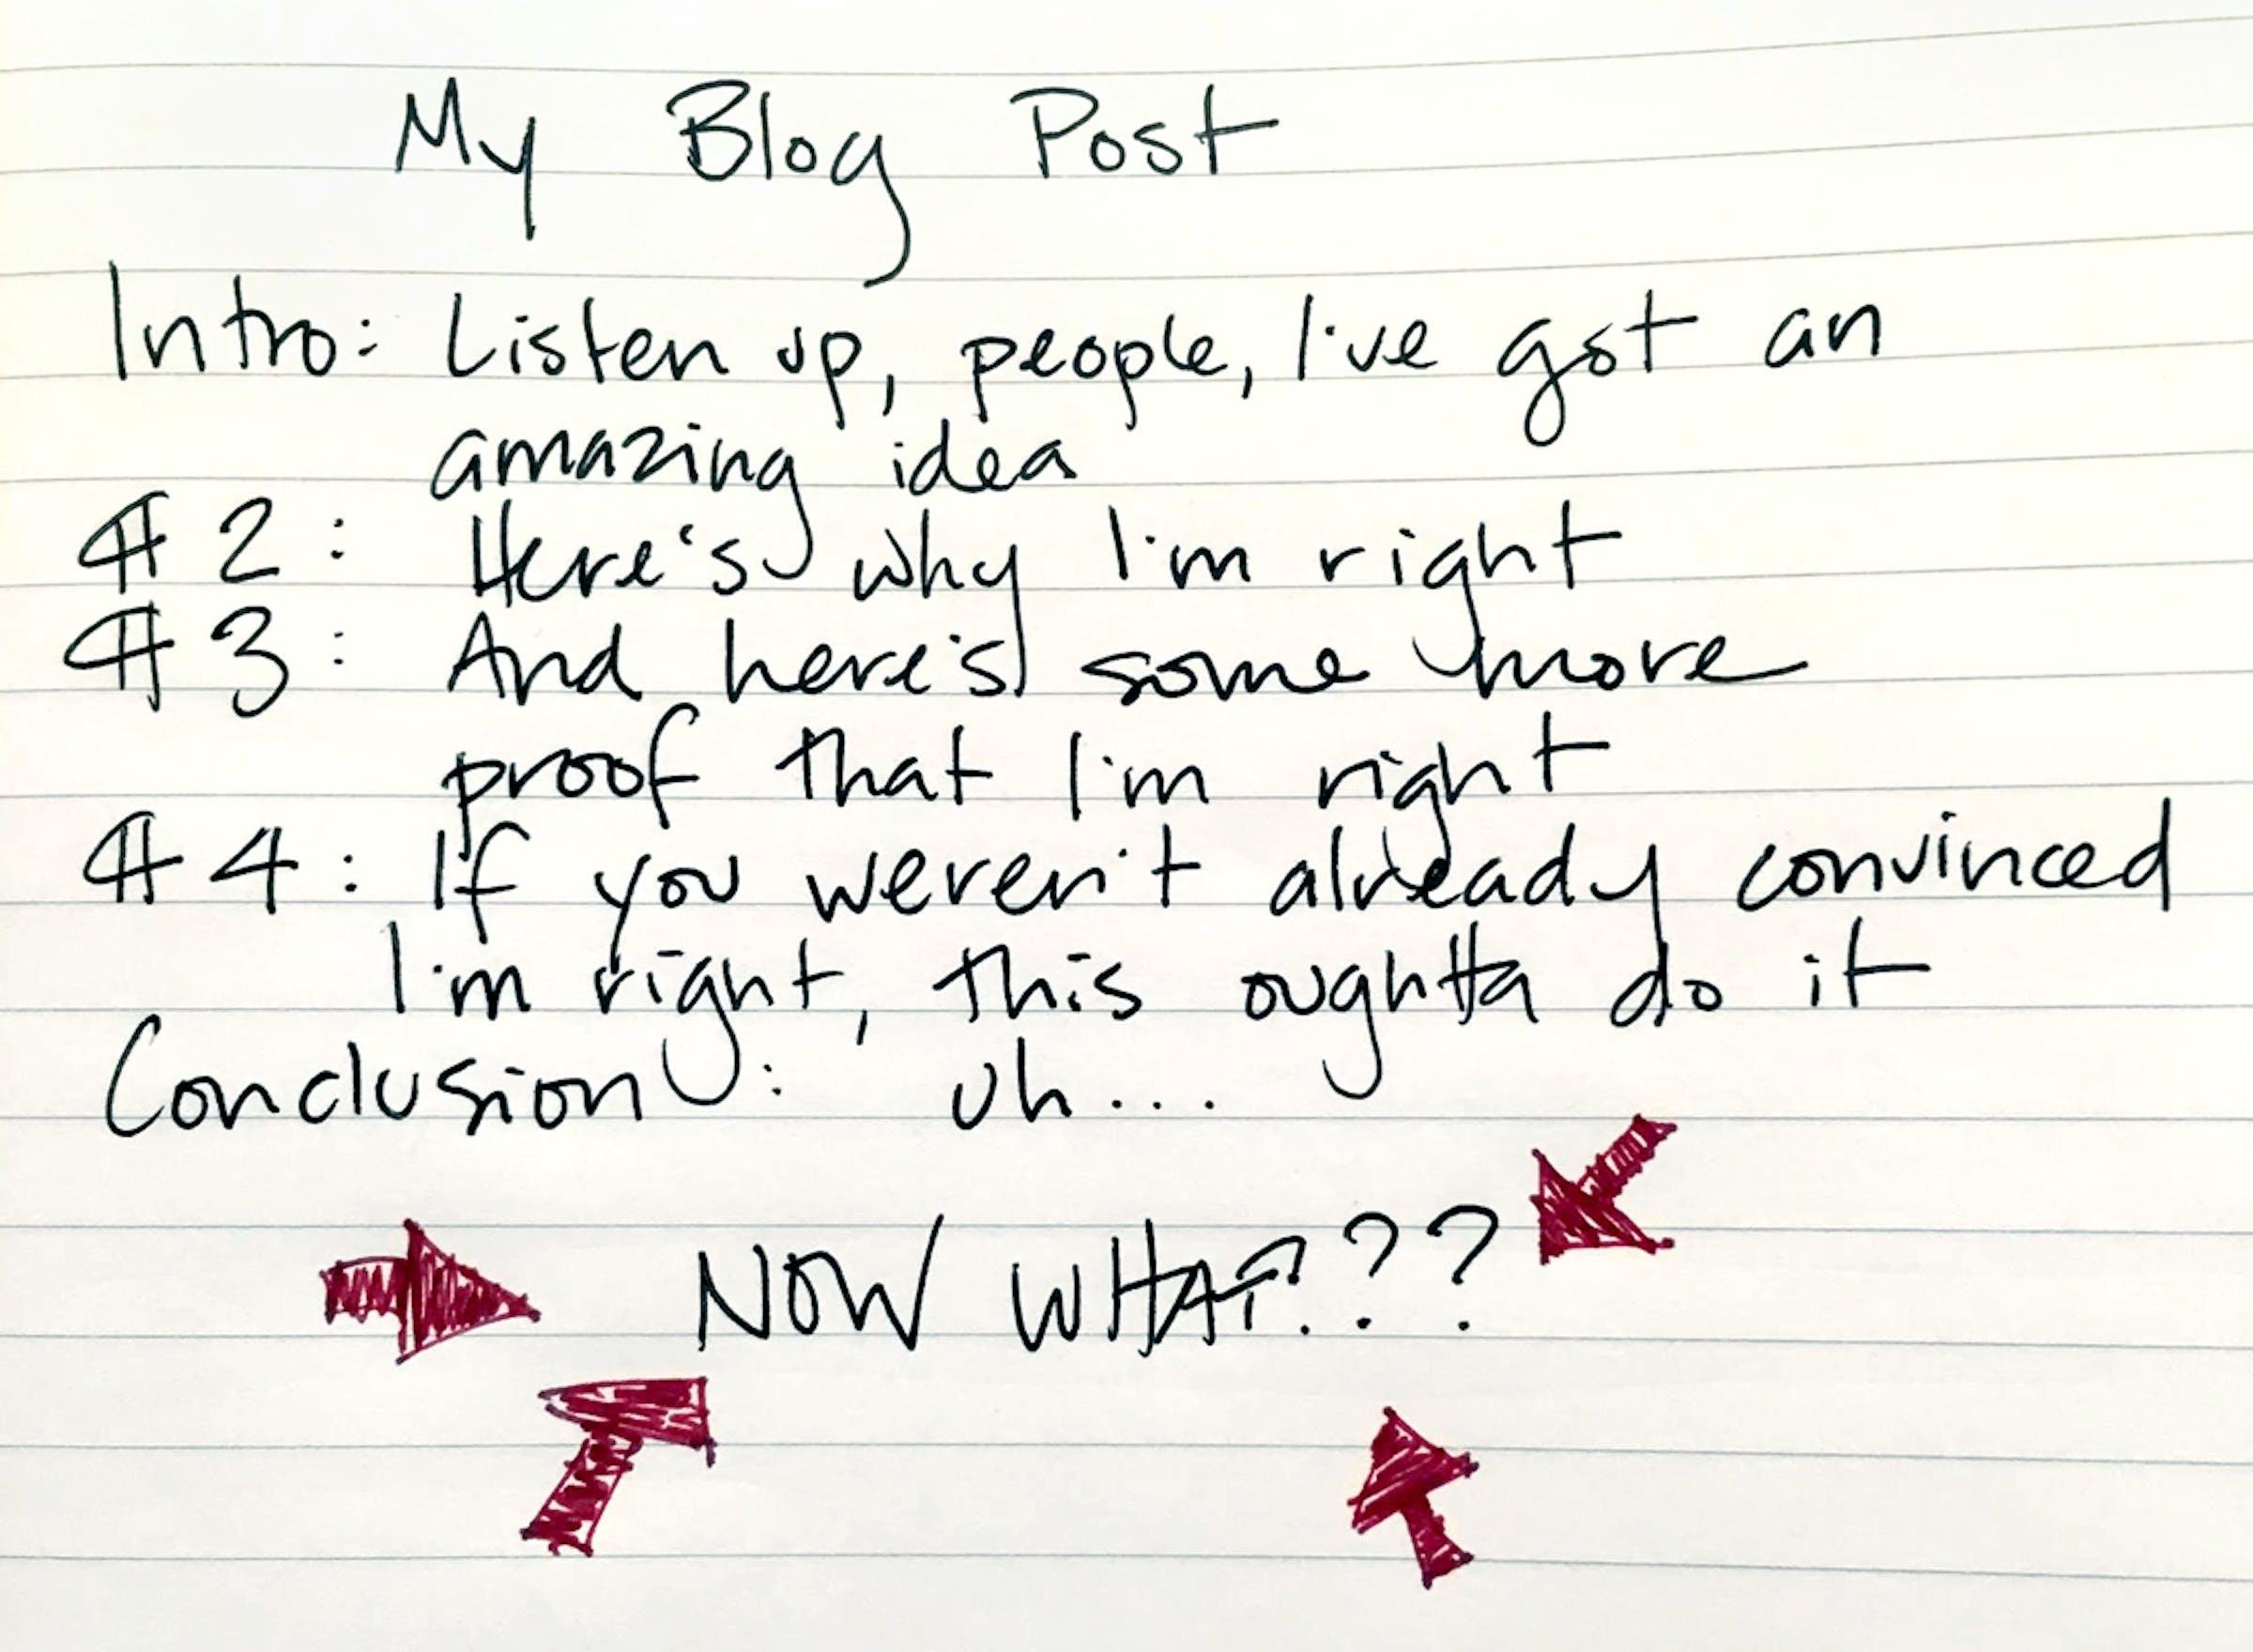 My blog post